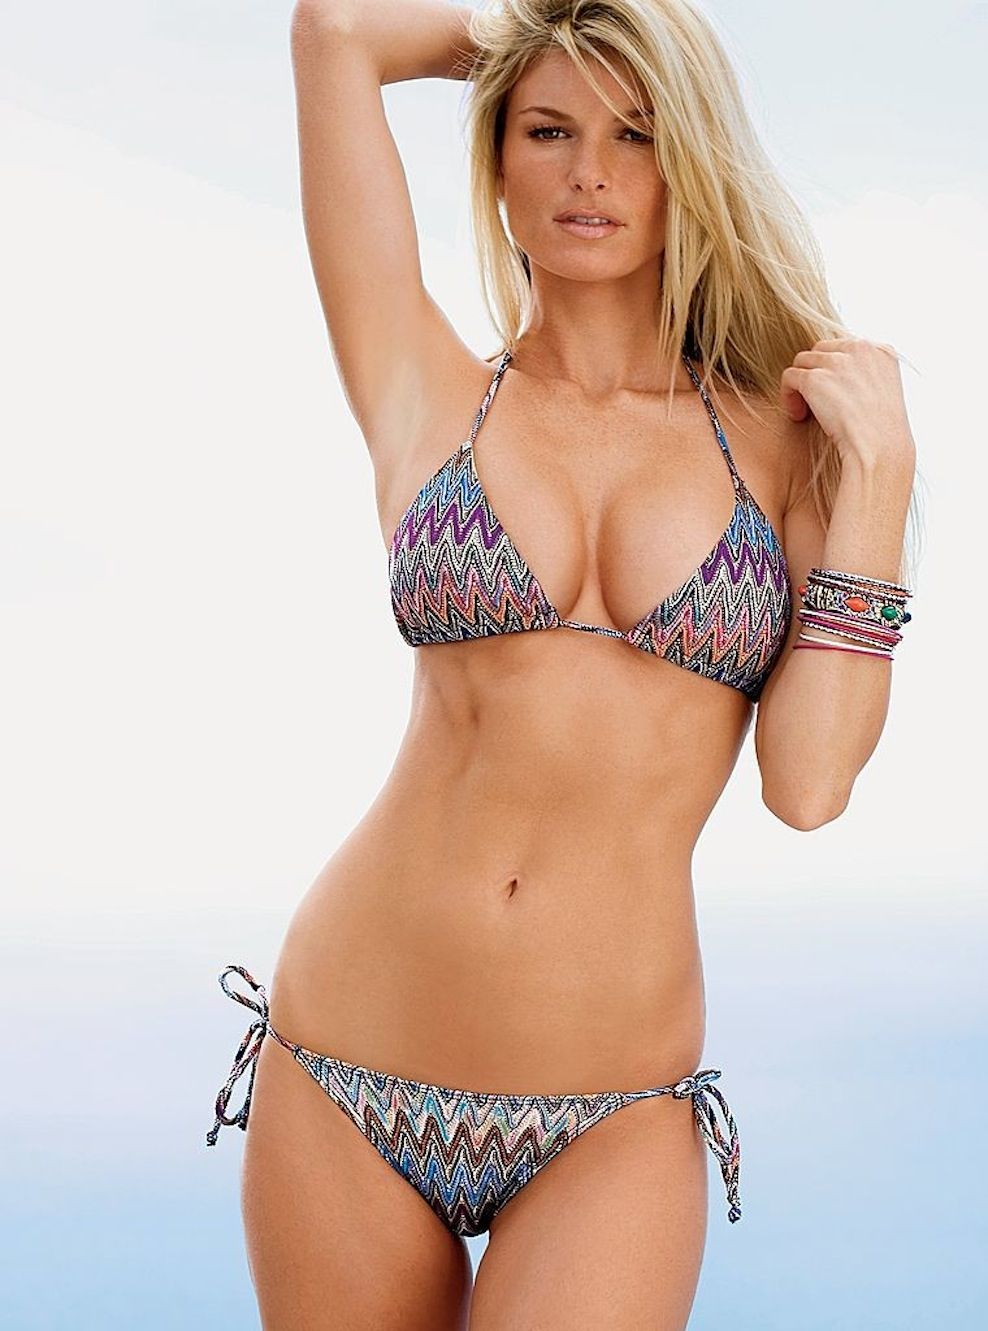 Marisa miller body paint swimsuit